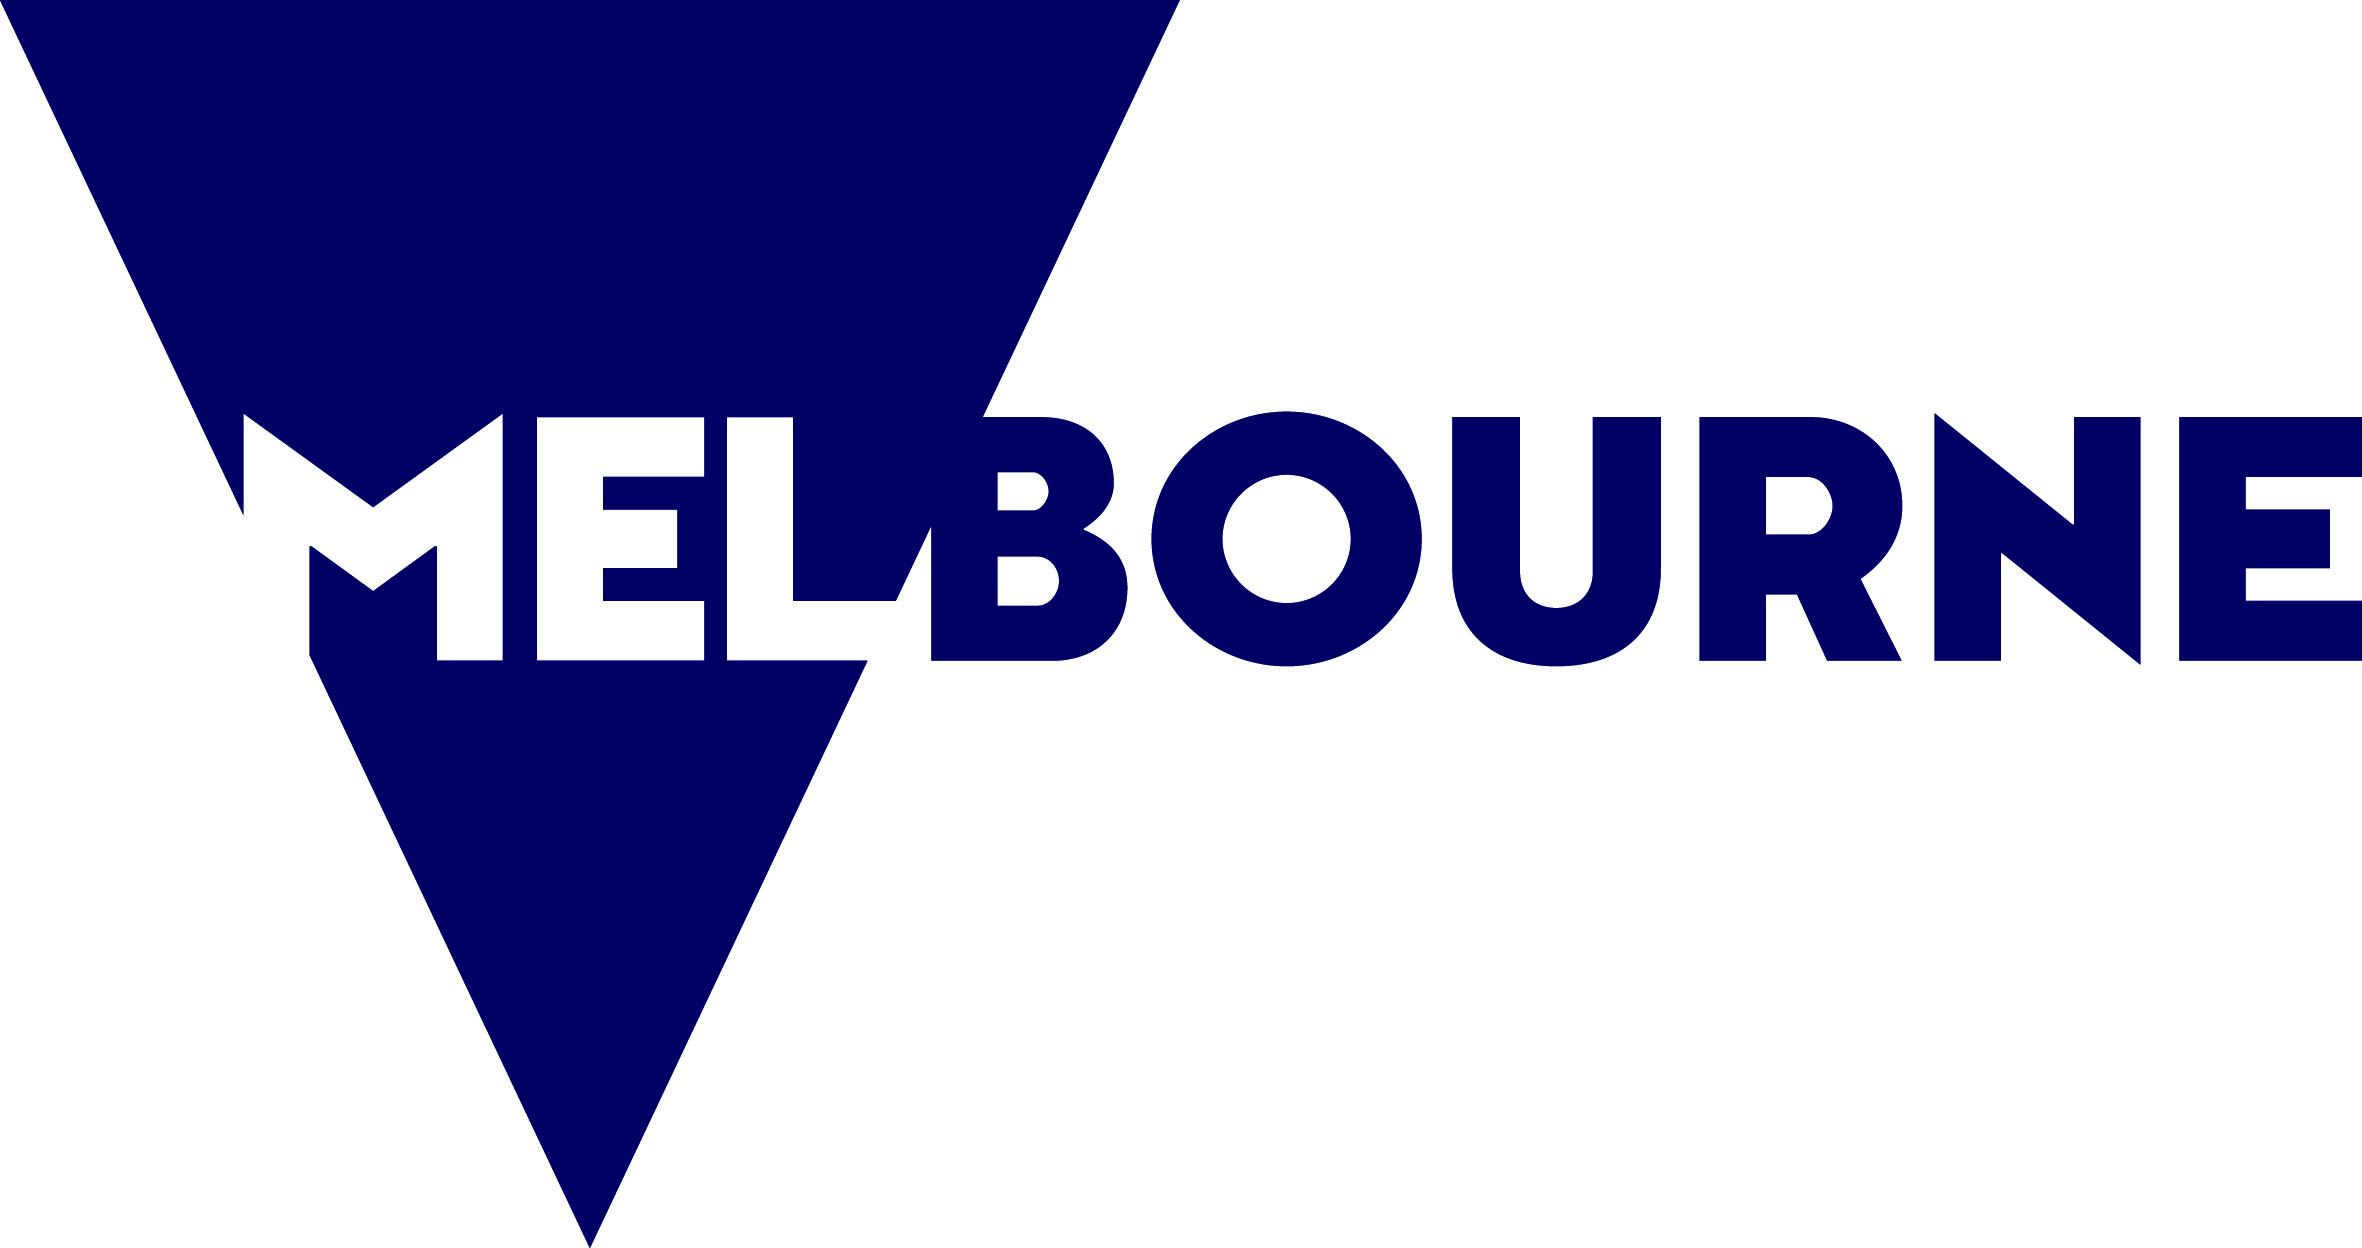 melbourne-logo-pms-2765-cmyk22.jpg